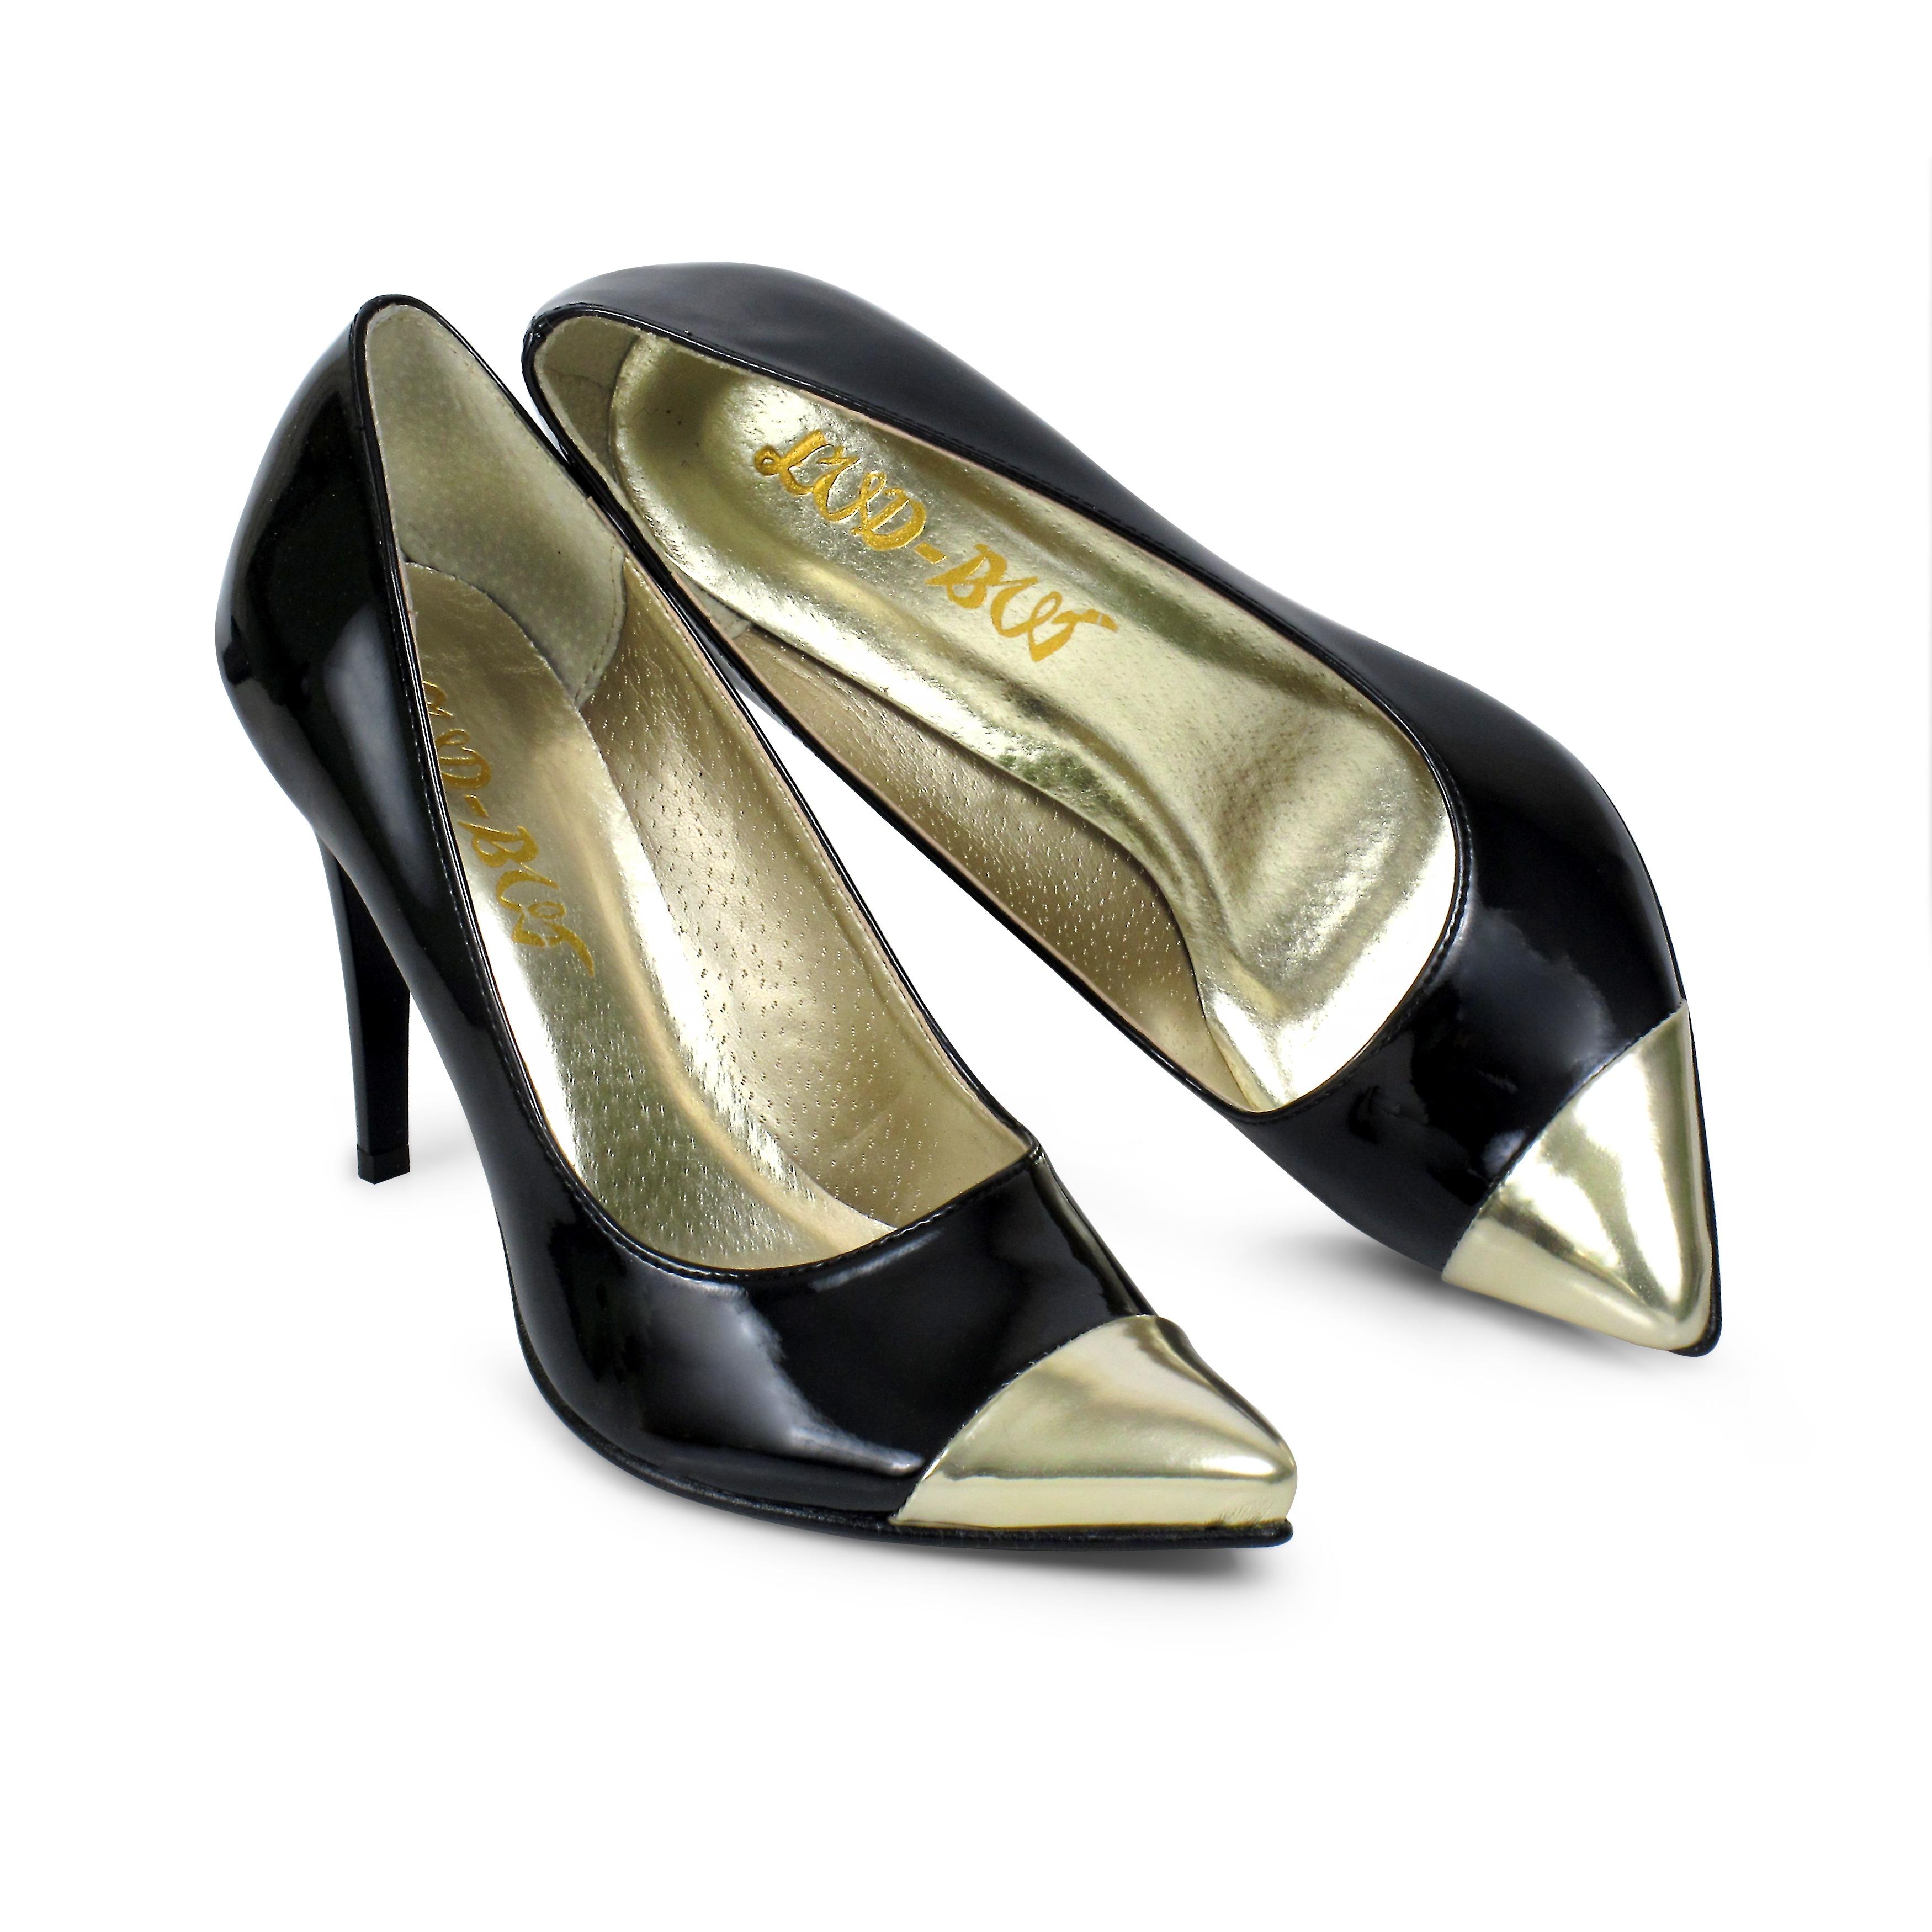 Free Images : leather, leg, high, fashion, pin, footwear